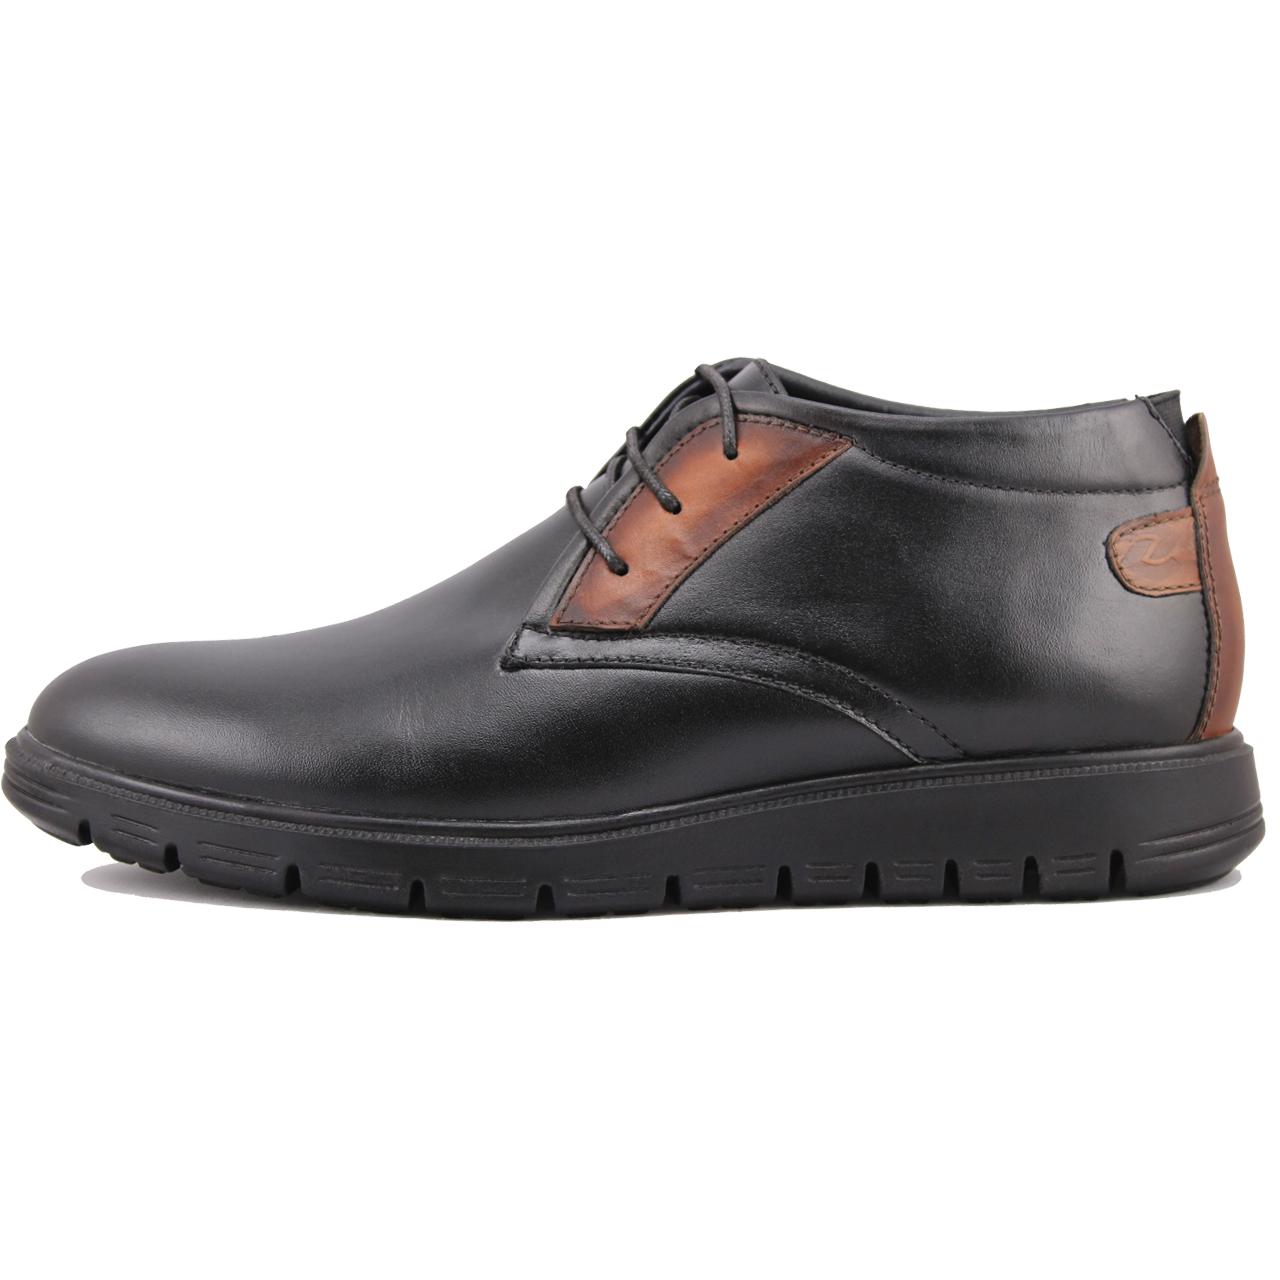 کفش مردانه چرم طبیعی ژاو مدل 1201